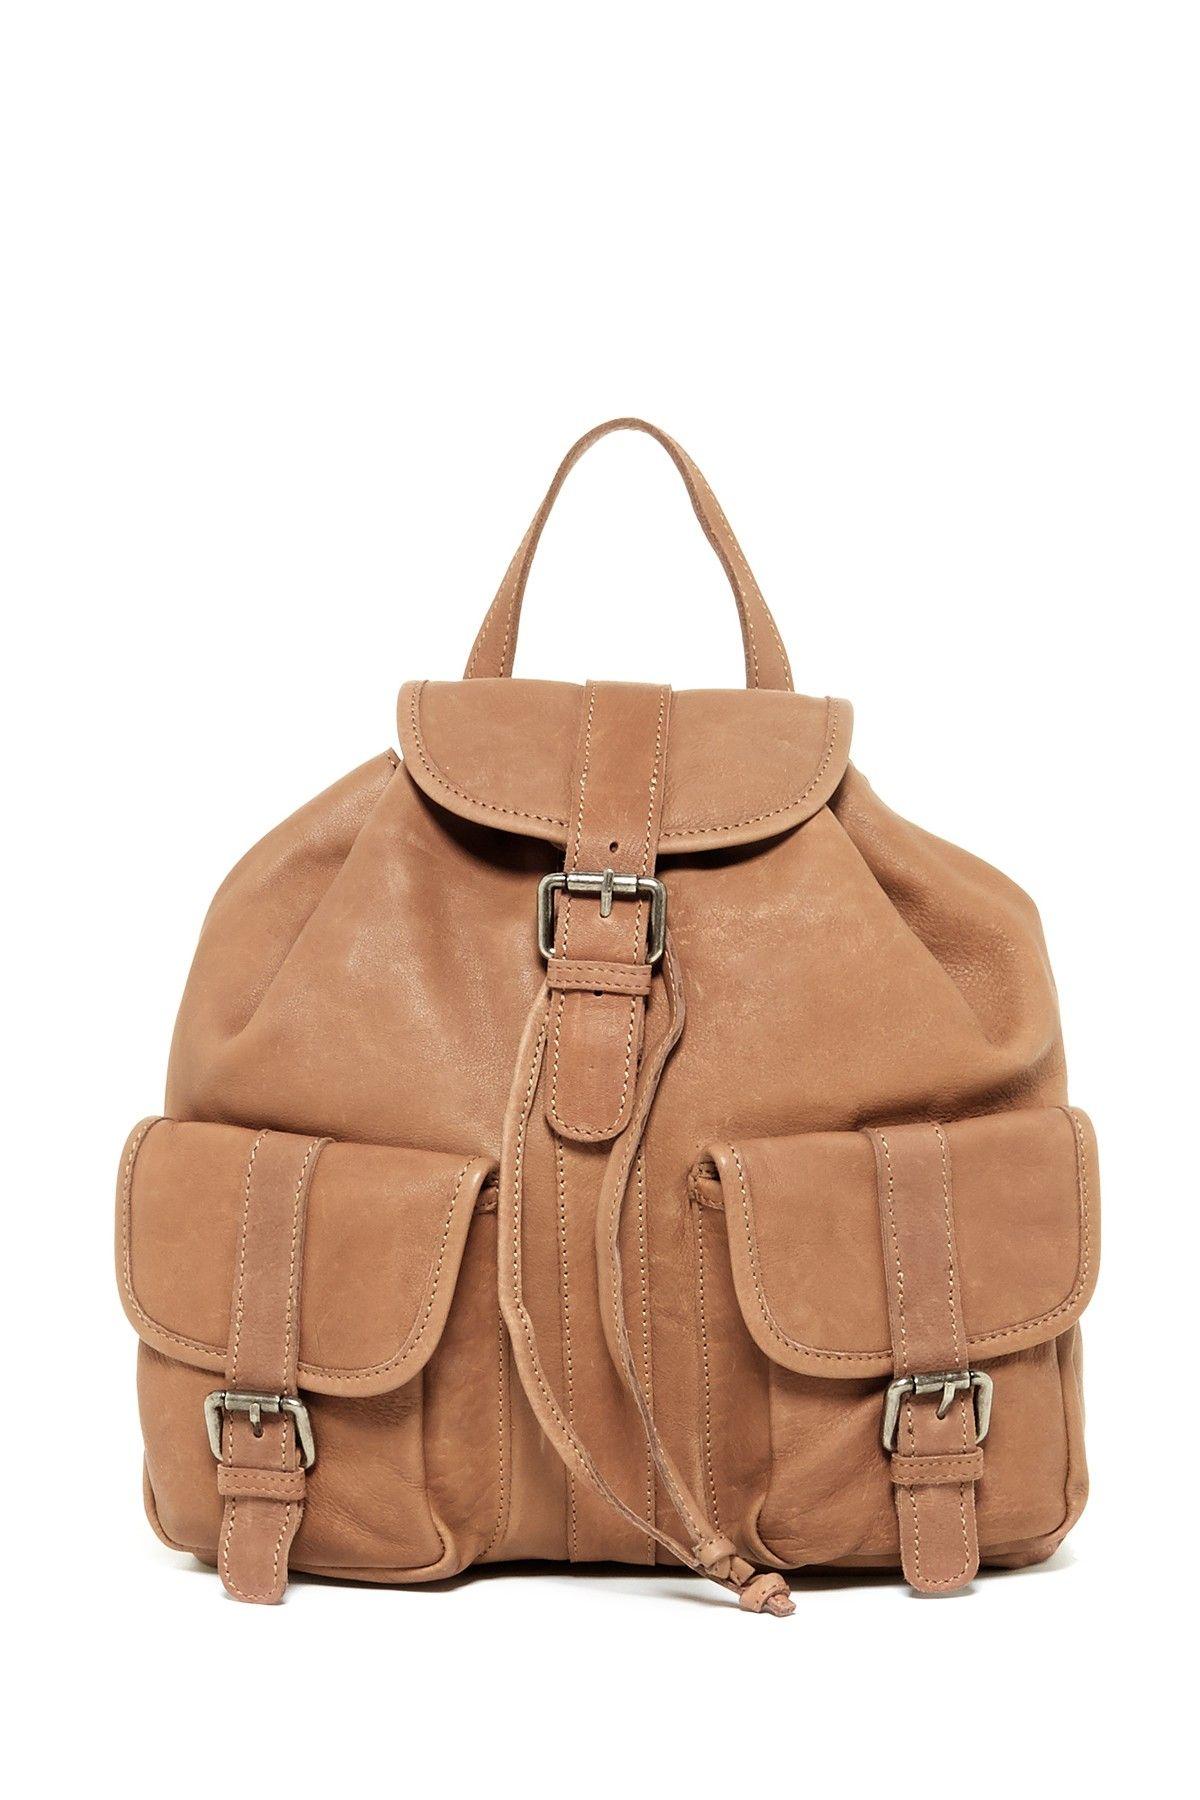 Cut N' Paste | Sabrina Leather Backpack | Nordstrom Rack